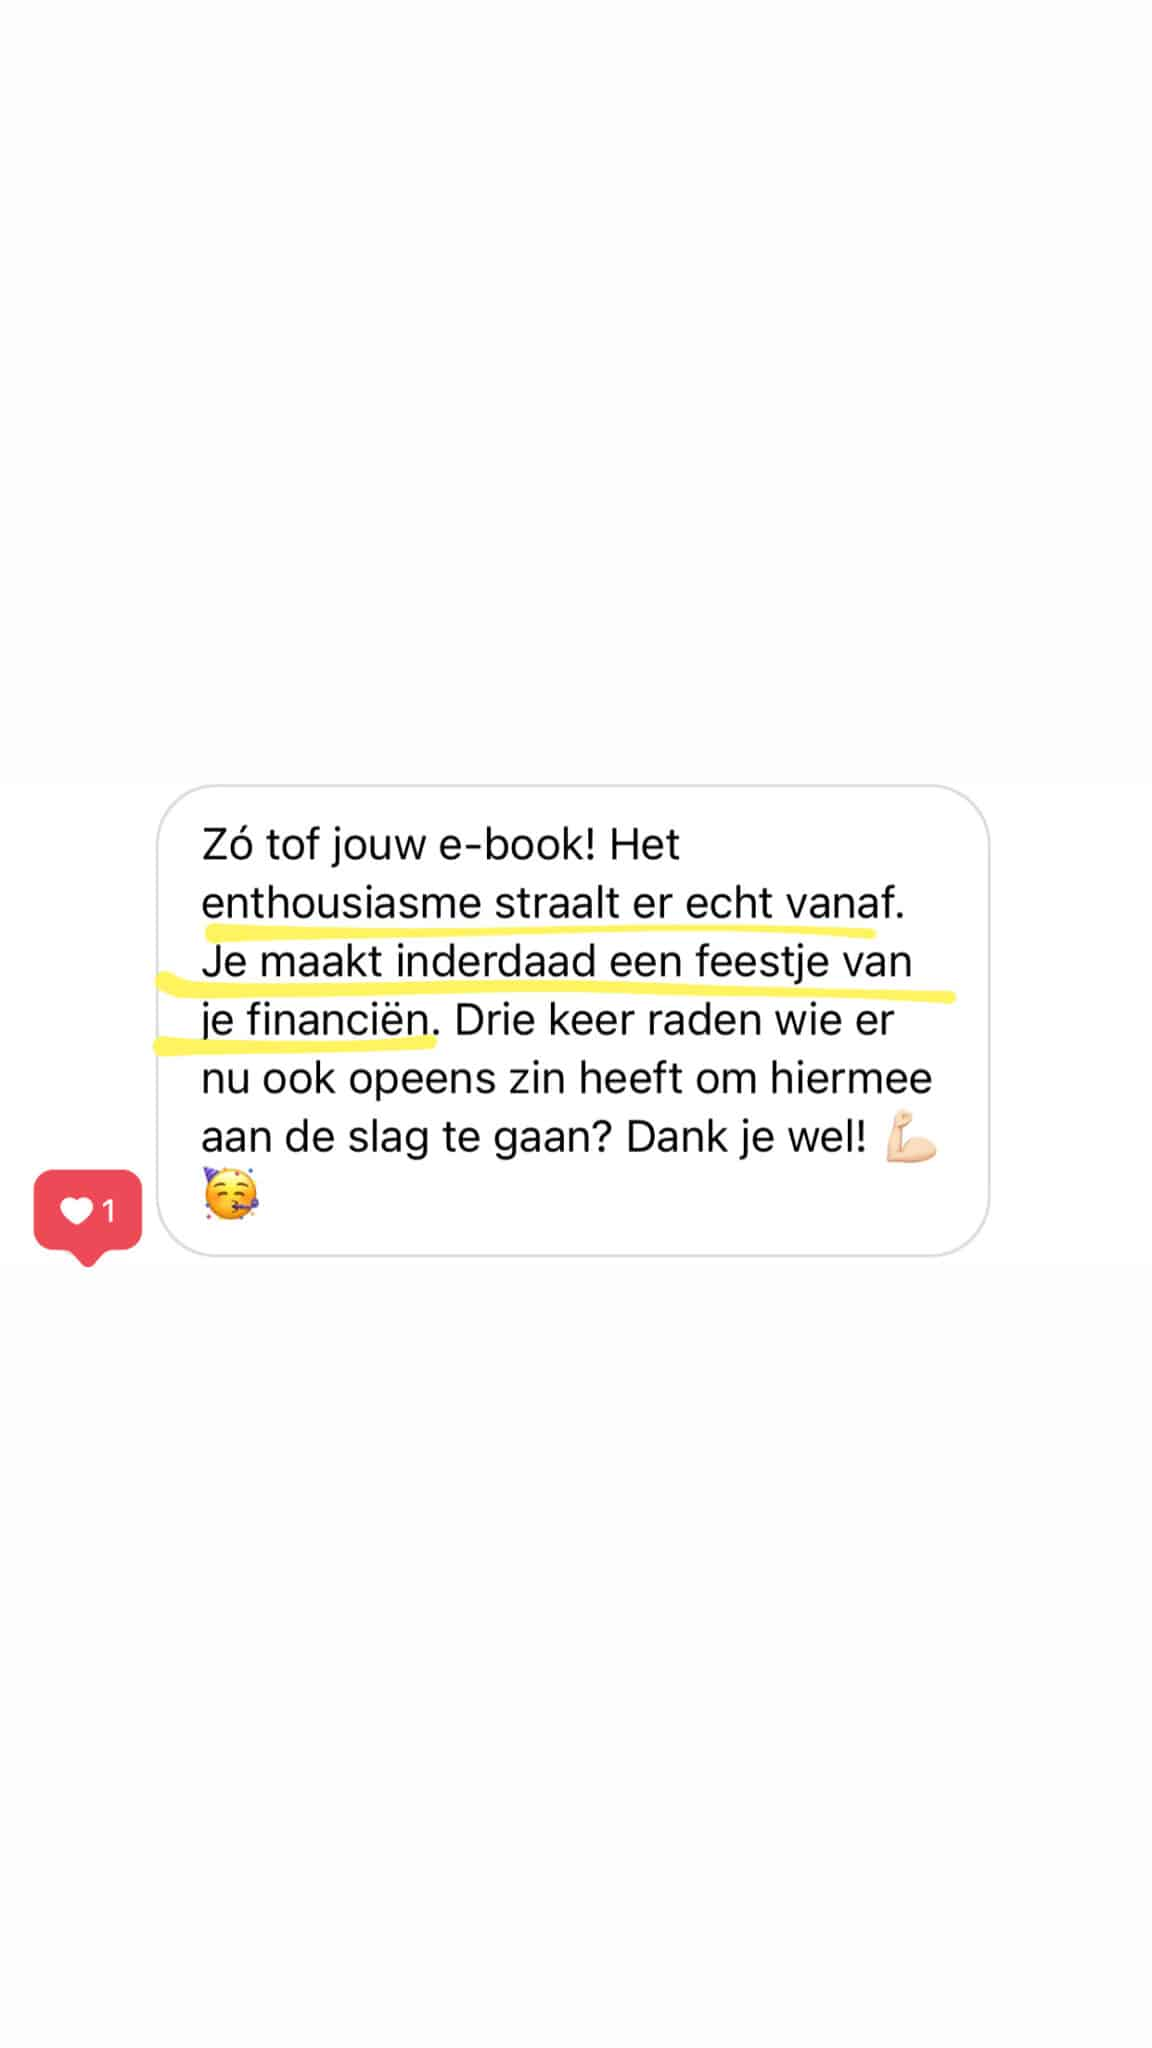 Review e-book Krijg grip op je financiën